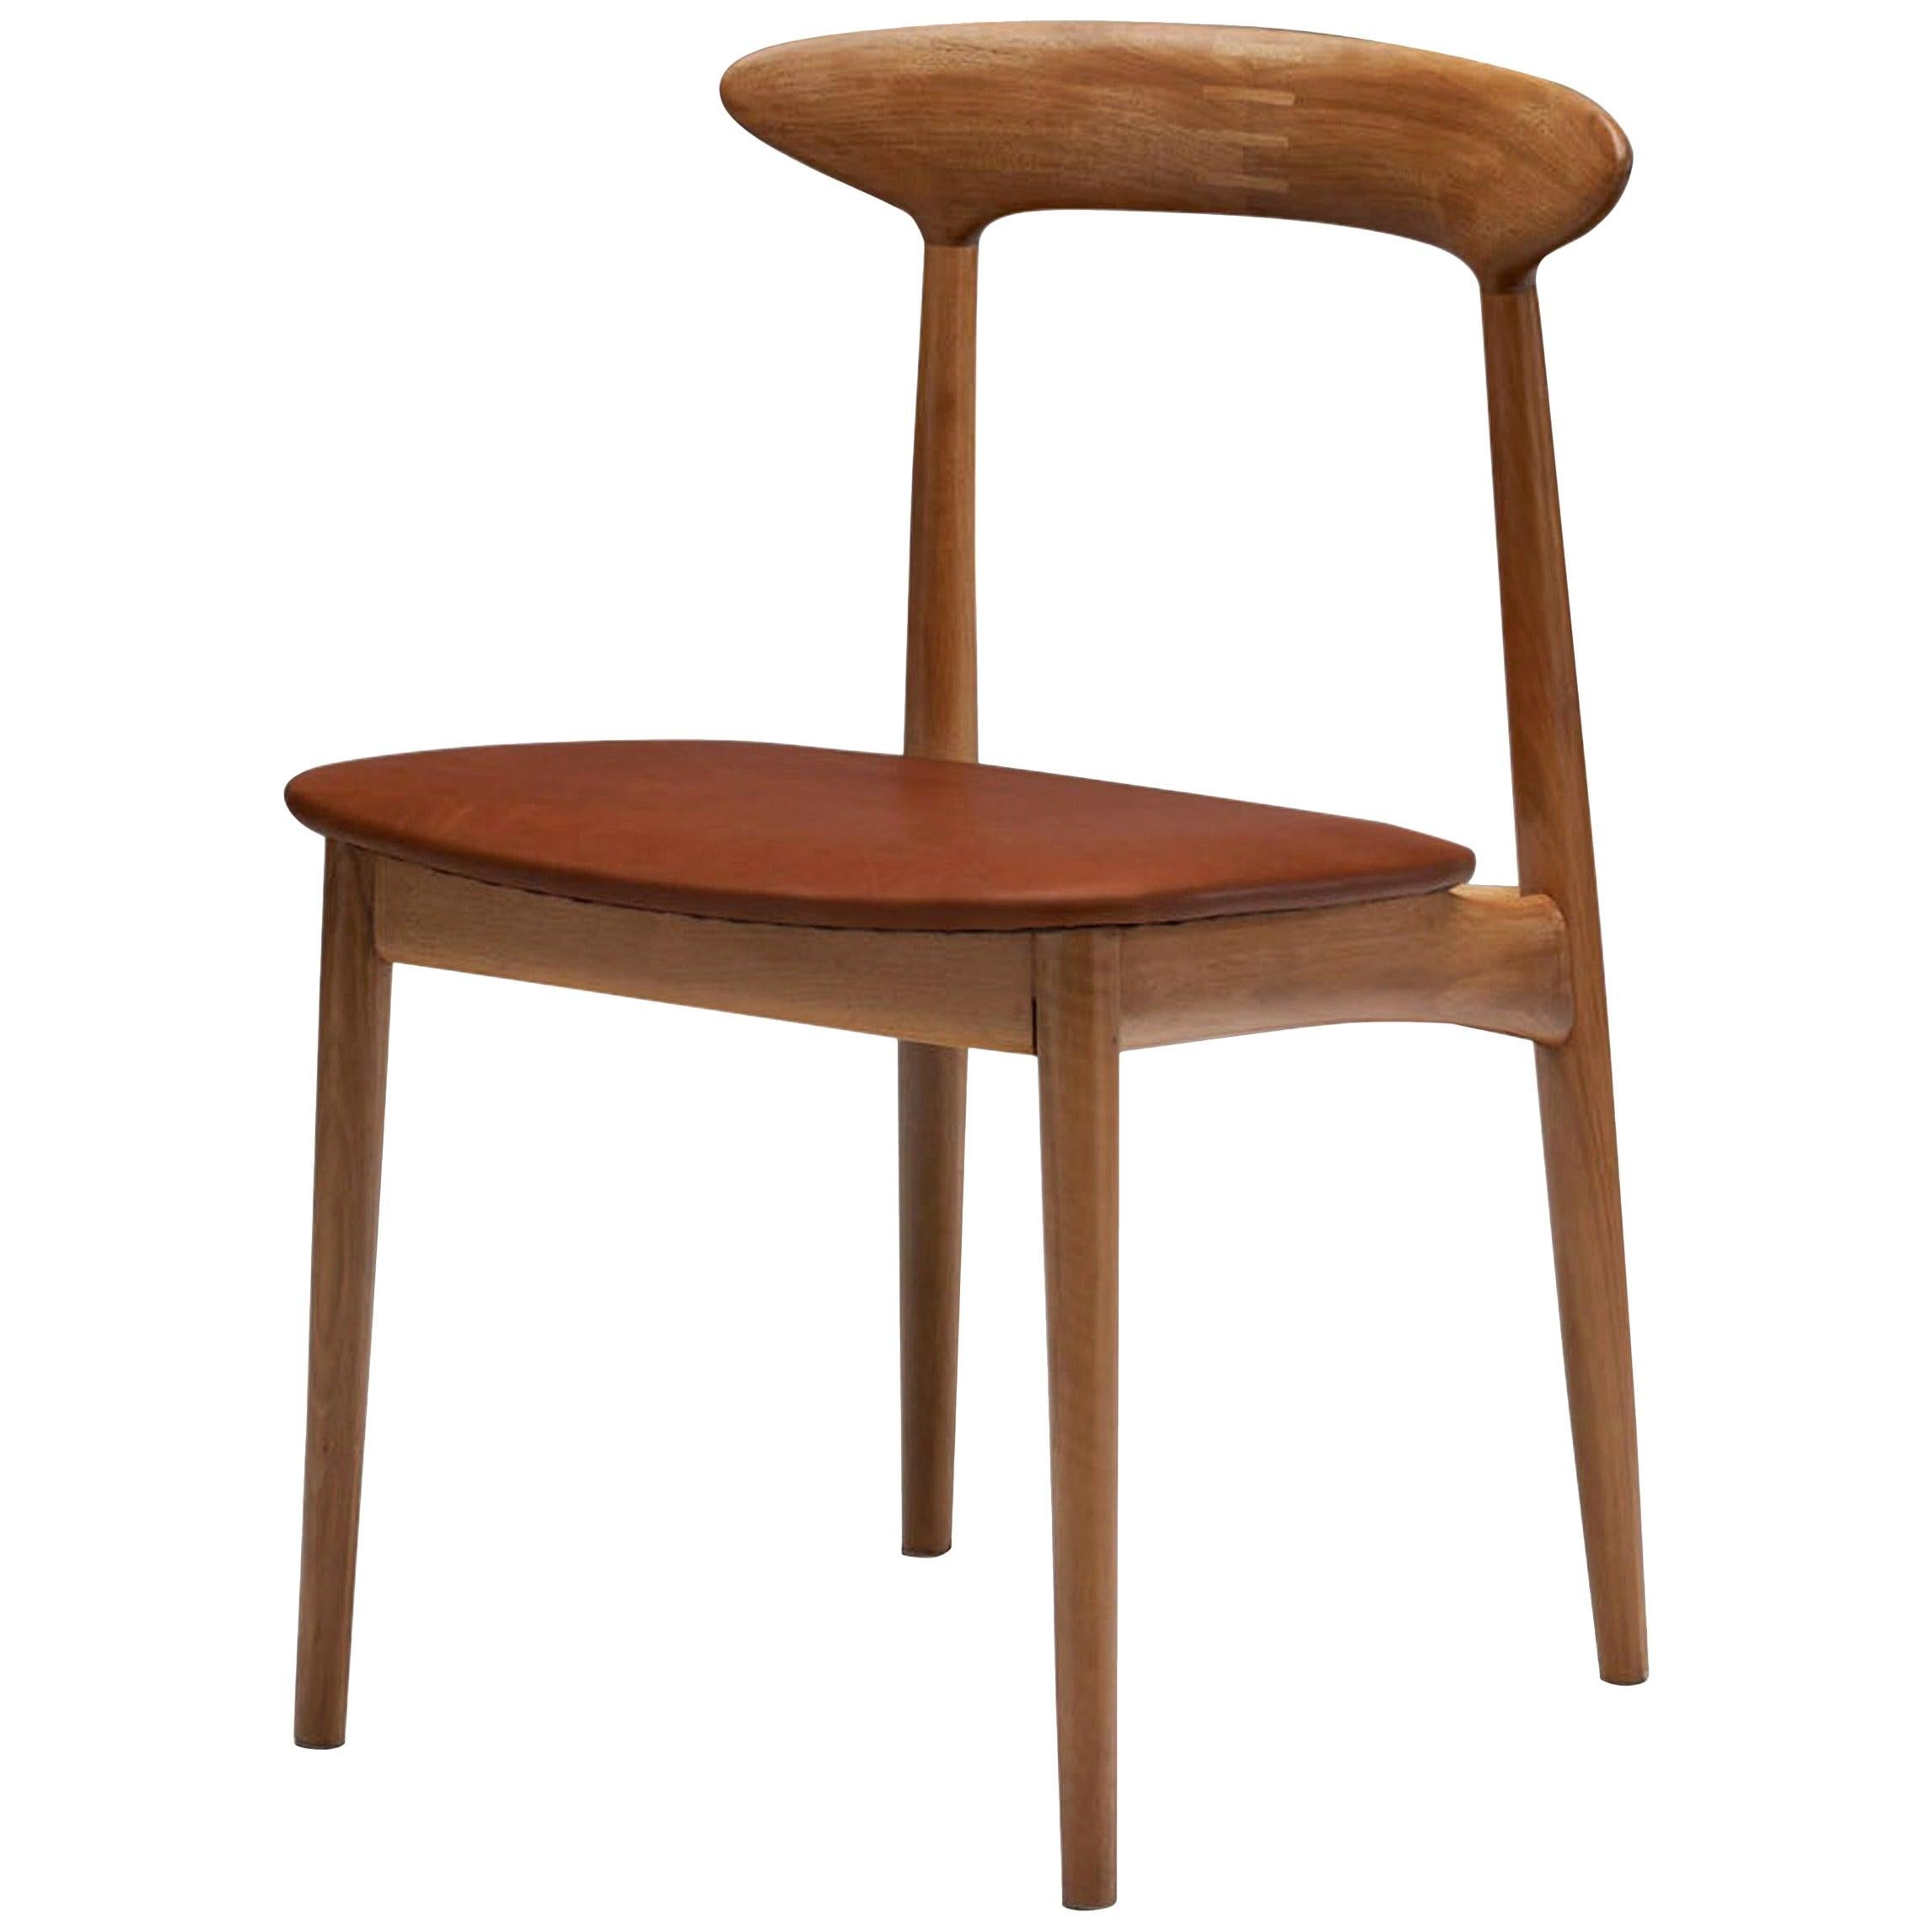 Kurt Østervig Walnut Dining Chair, Denmark, 1950s